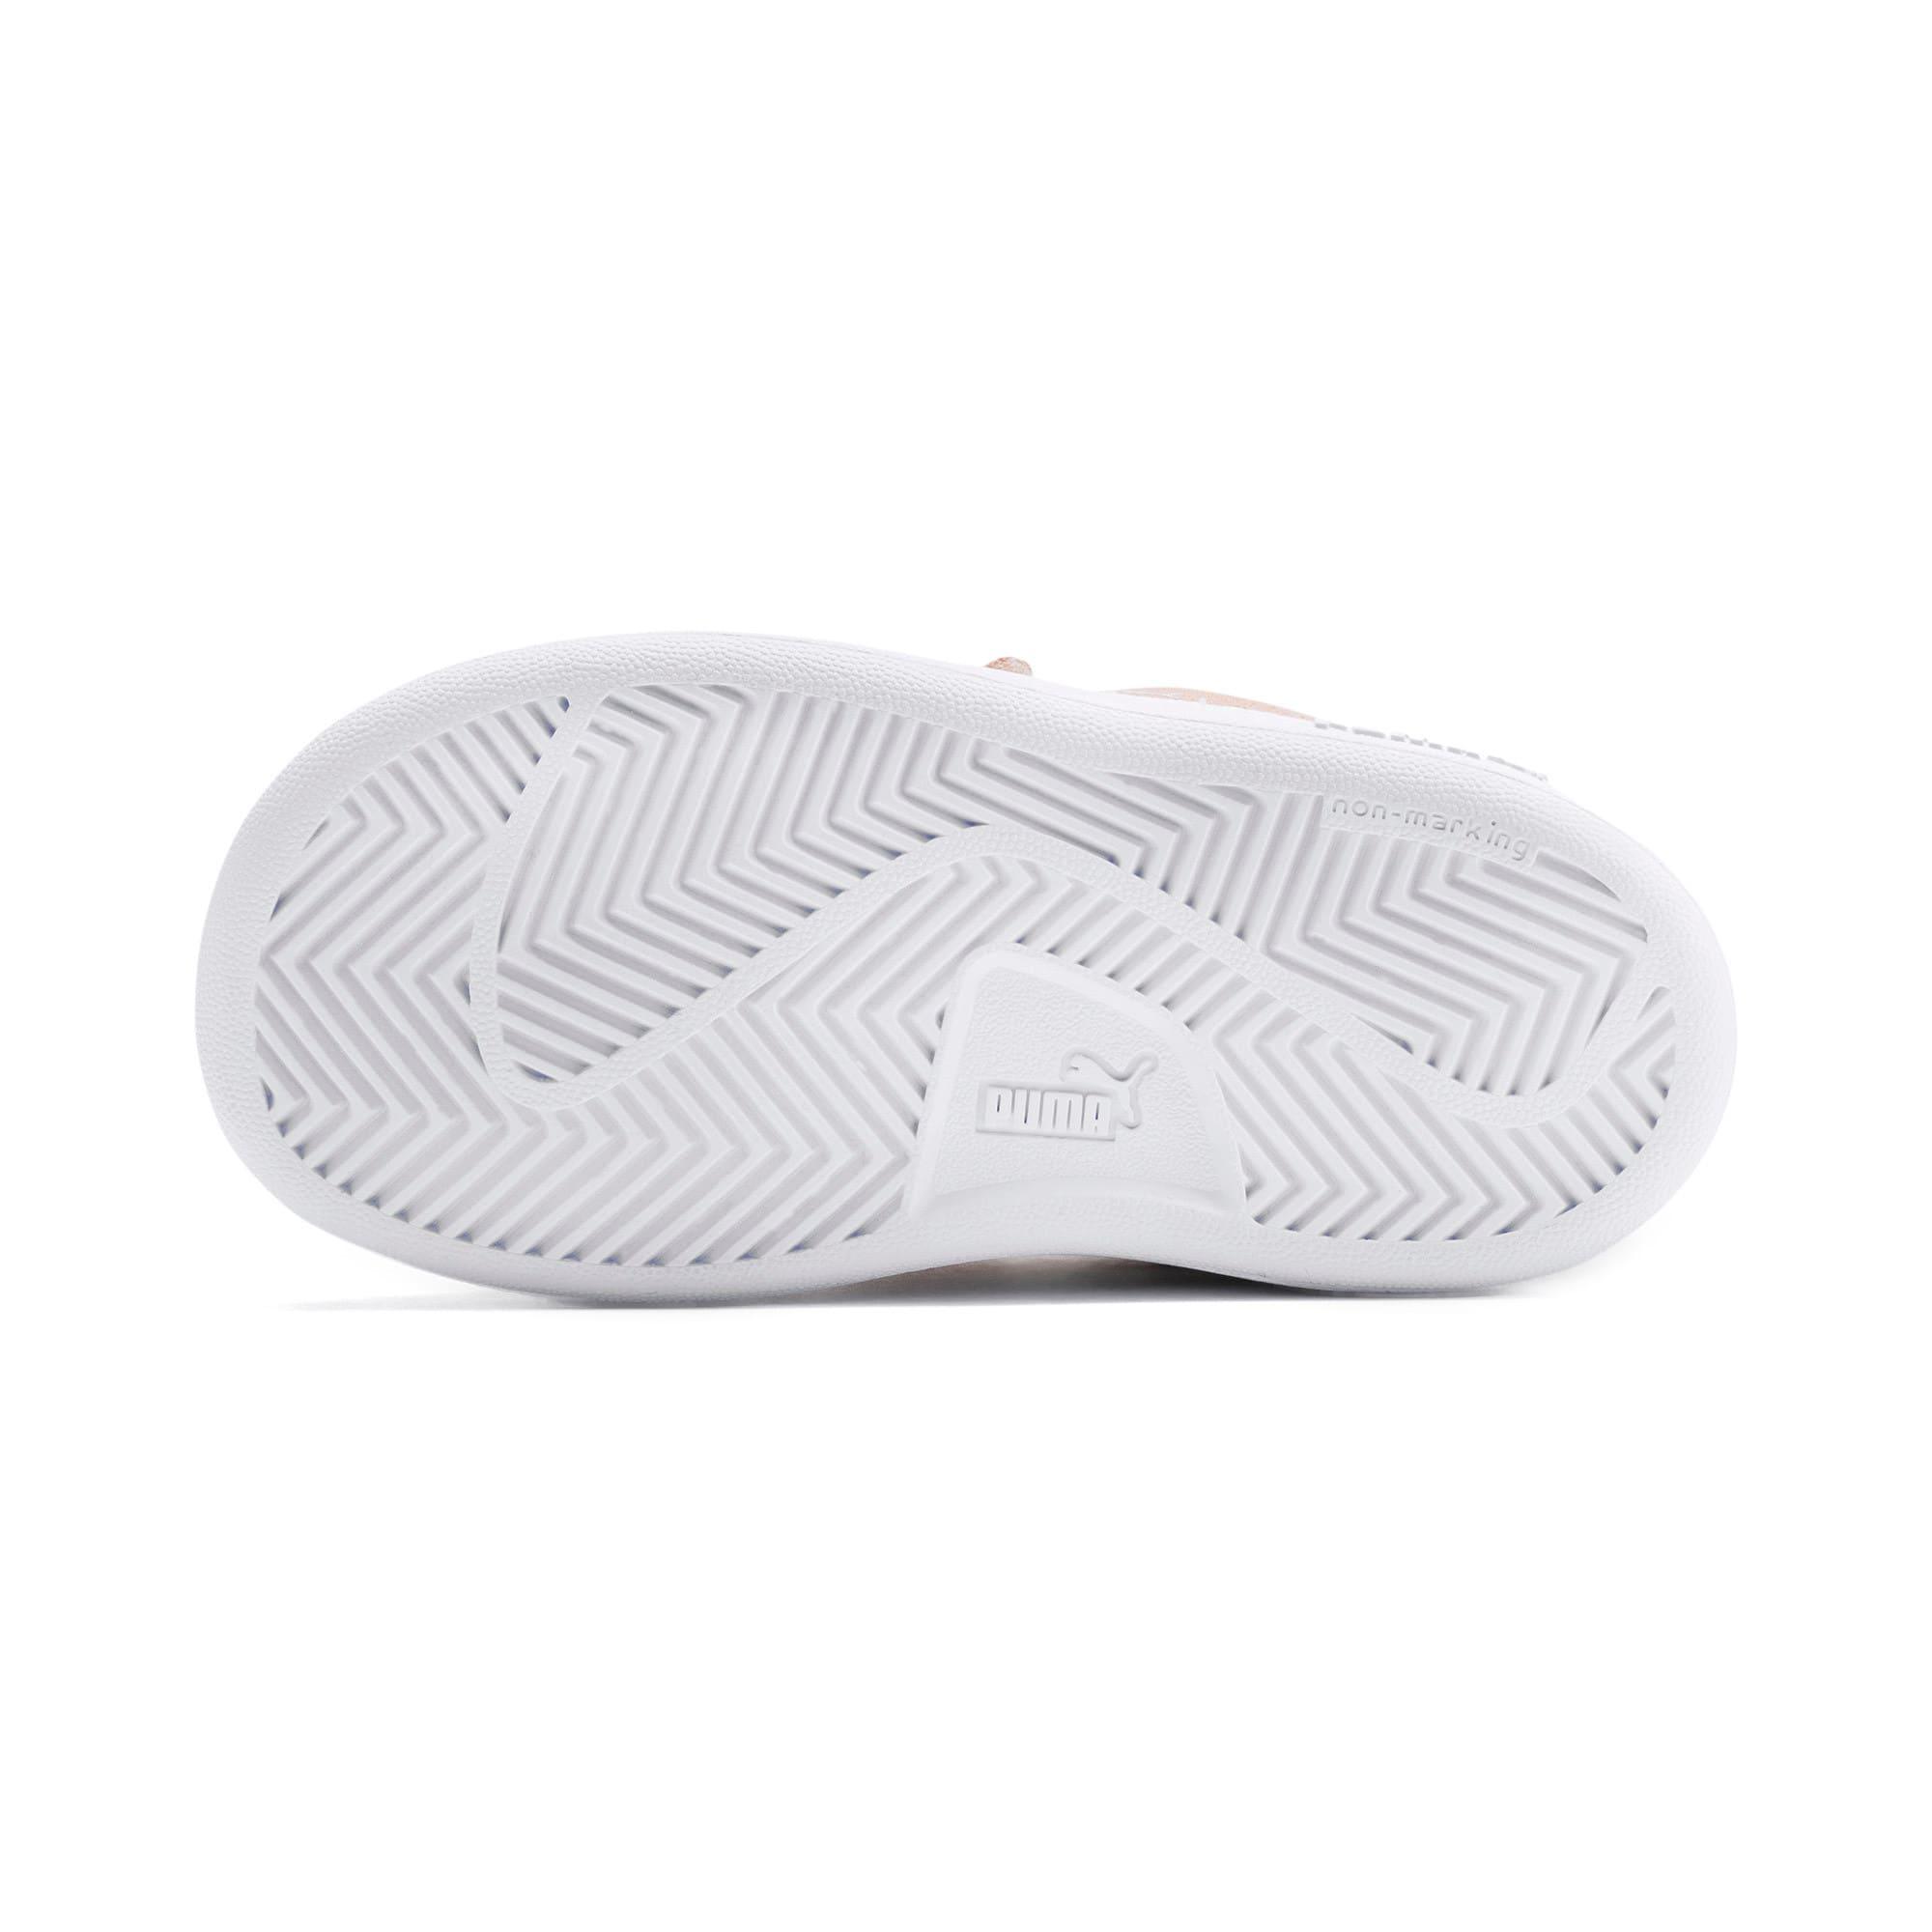 Thumbnail 4 of PUMA Smash v2 Suede Toddler Shoes, Peach Parfait-Puma White, medium